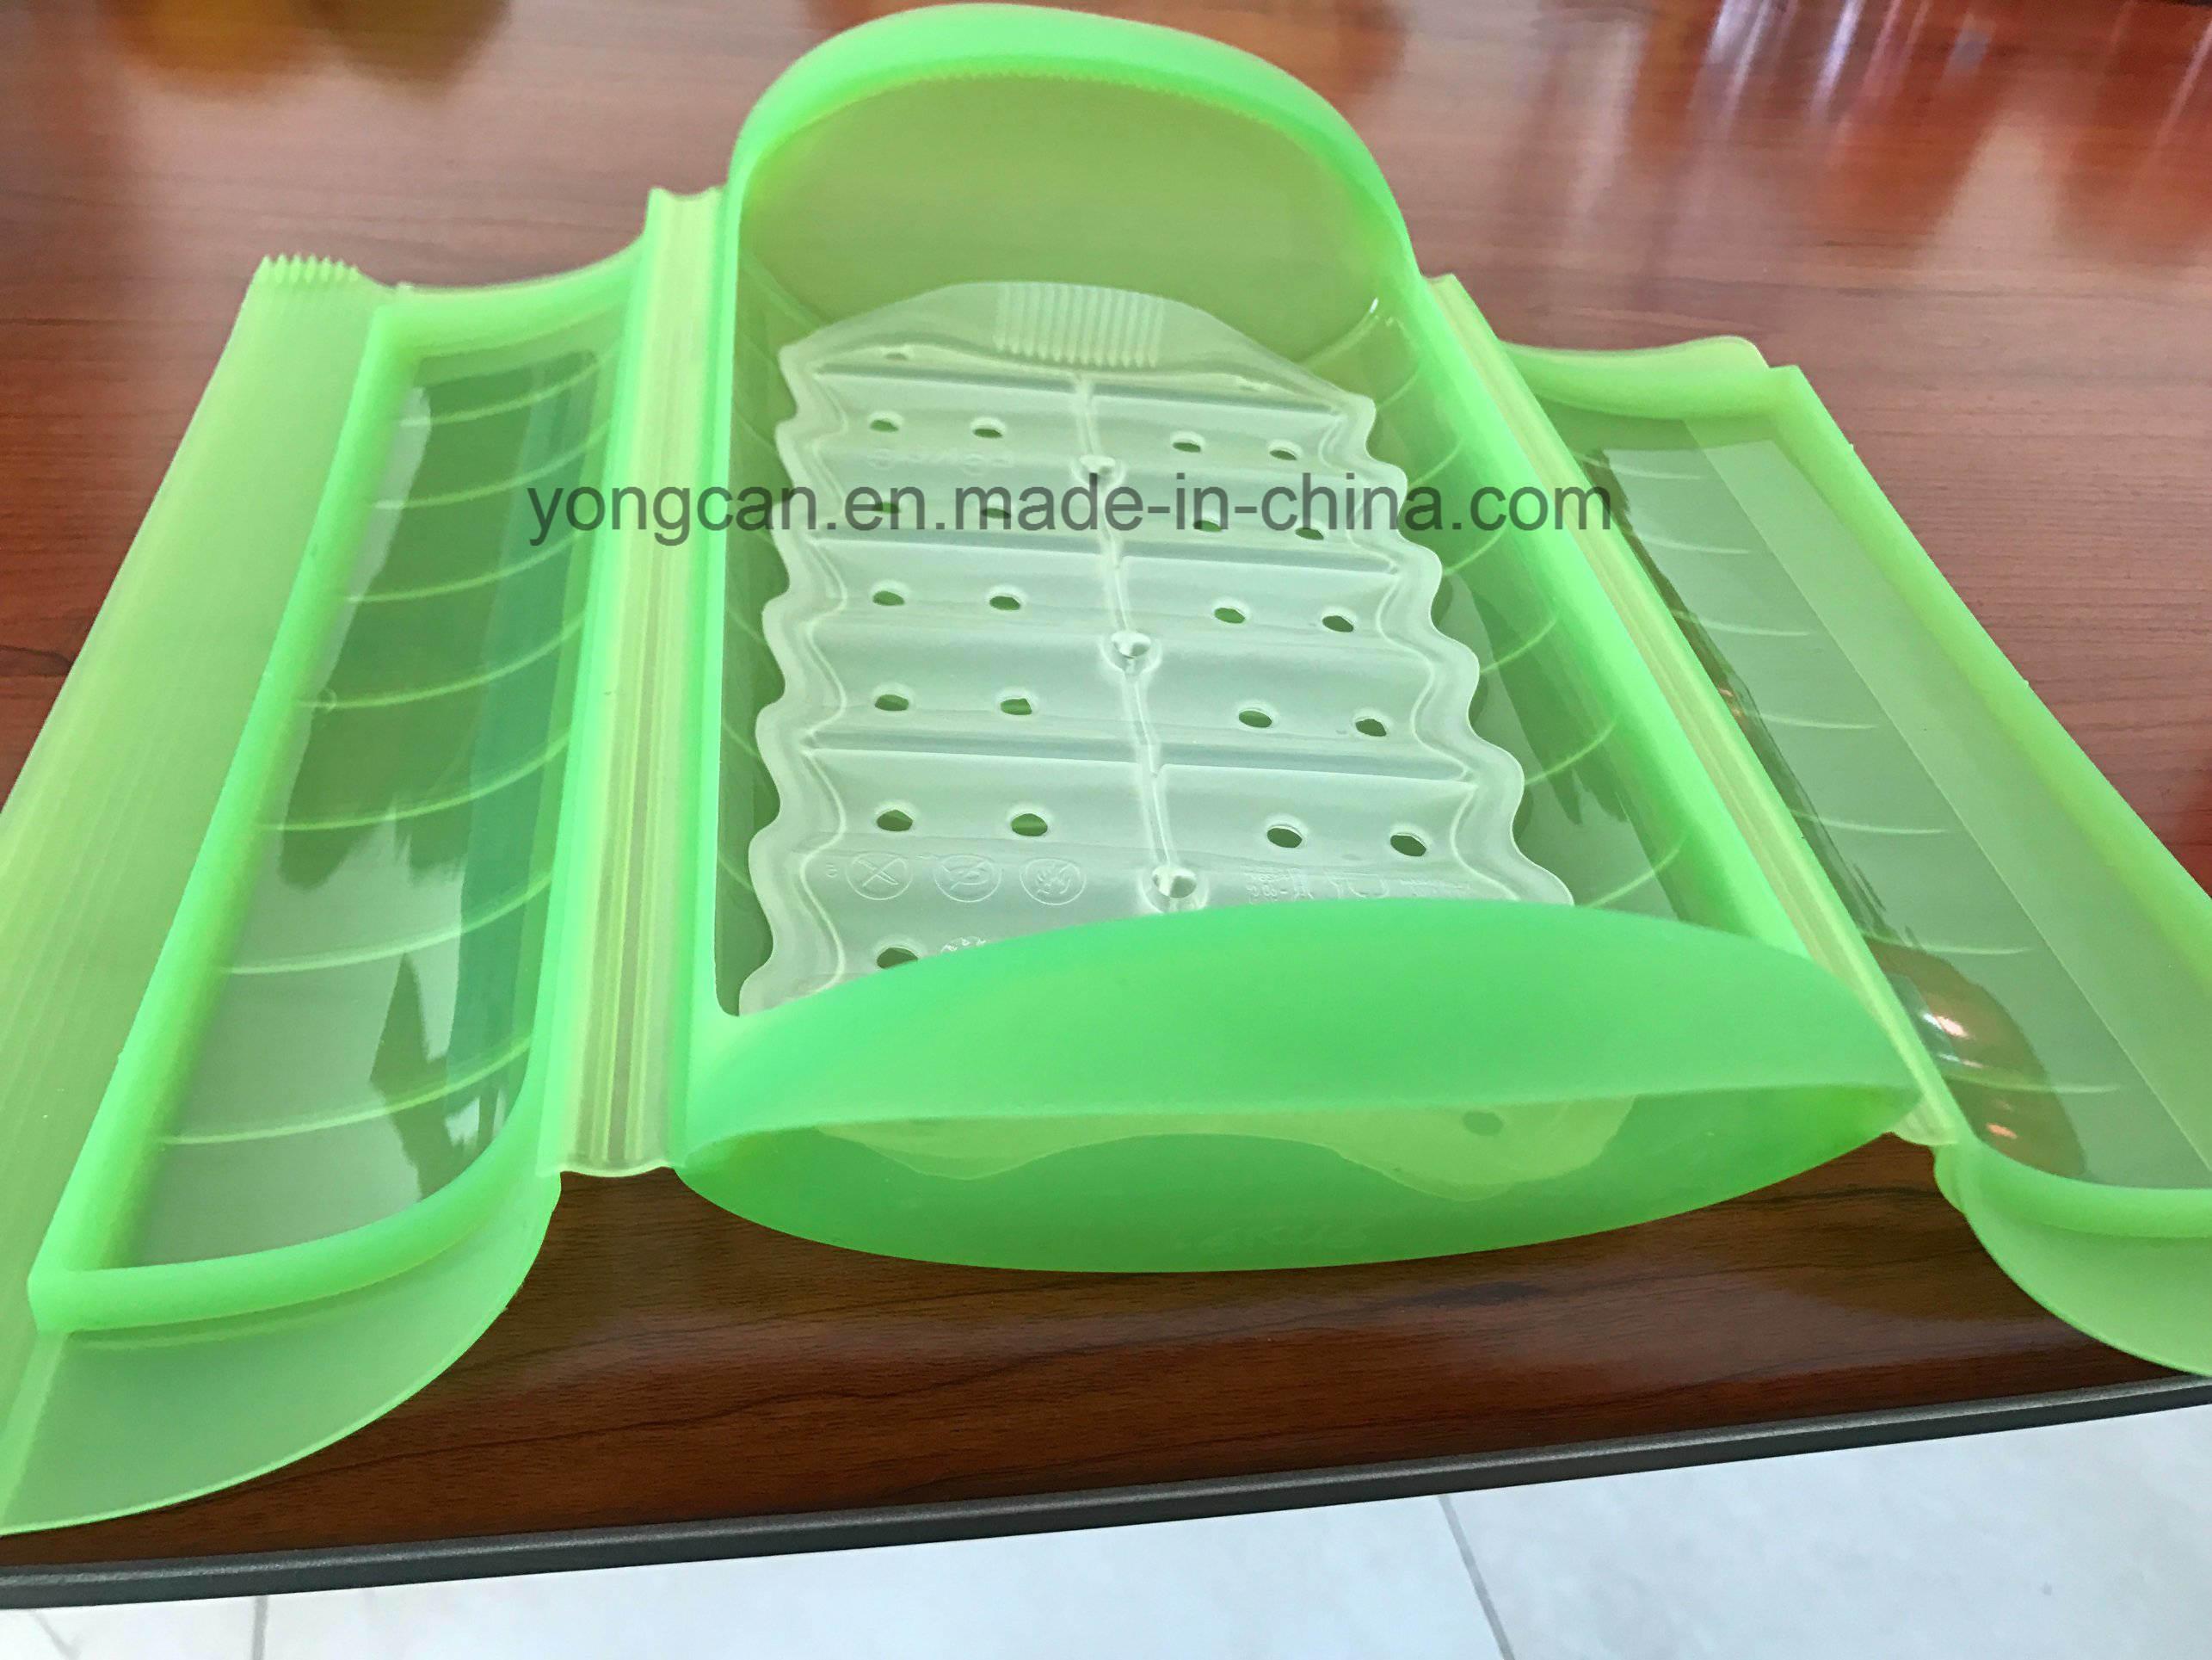 OEM Customize Microwave Used Platnum Silicone Plastic Box